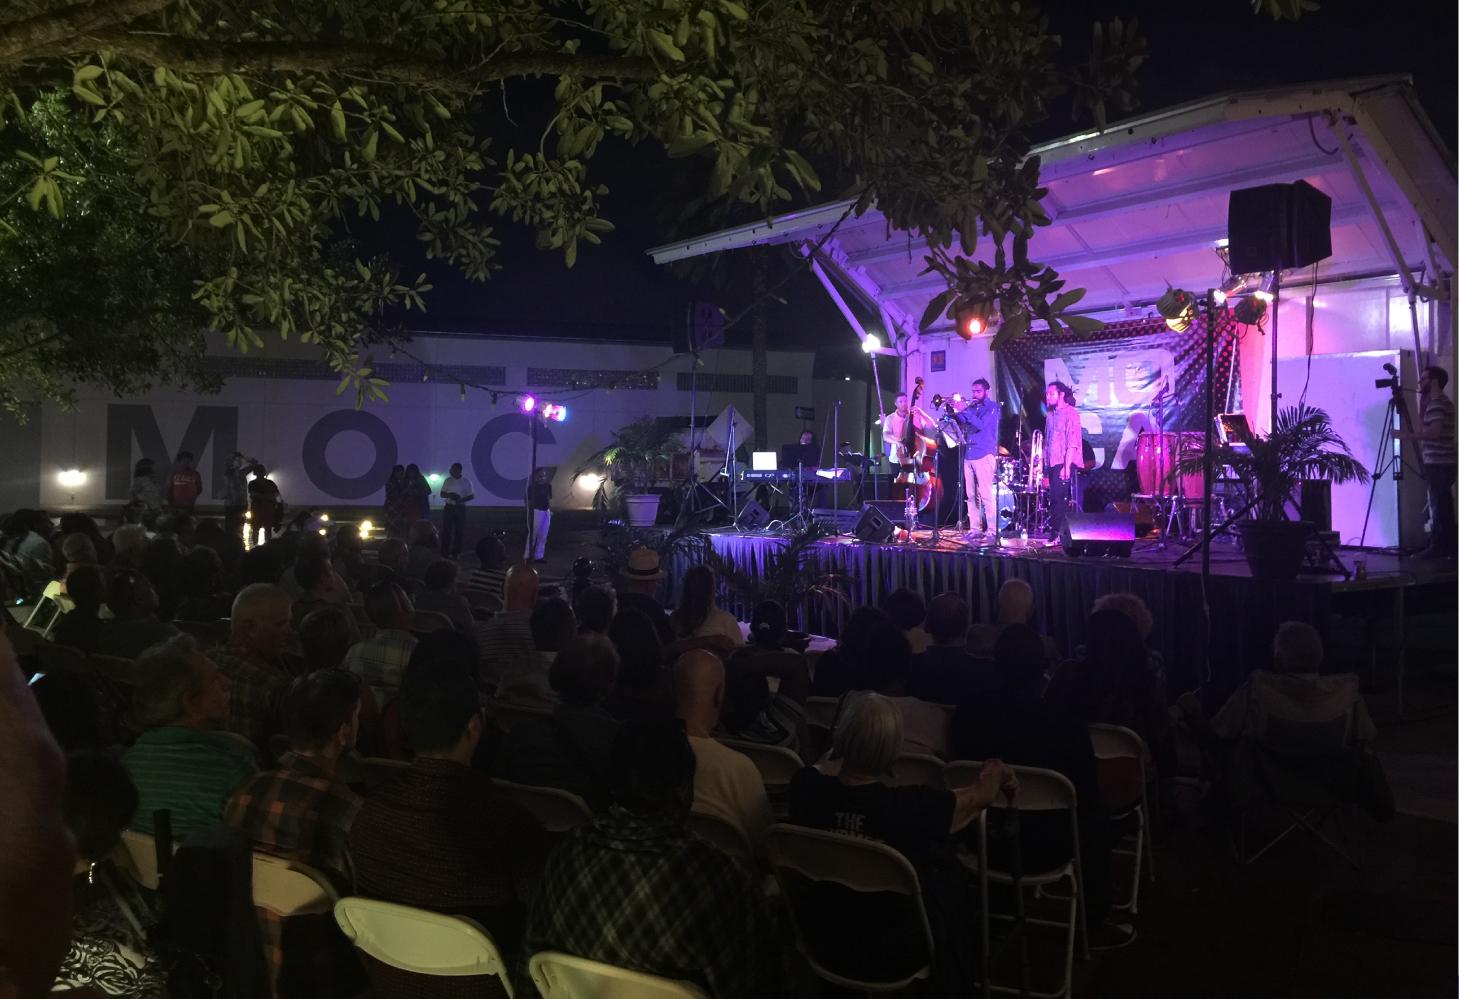 Jazz at MOCA concert